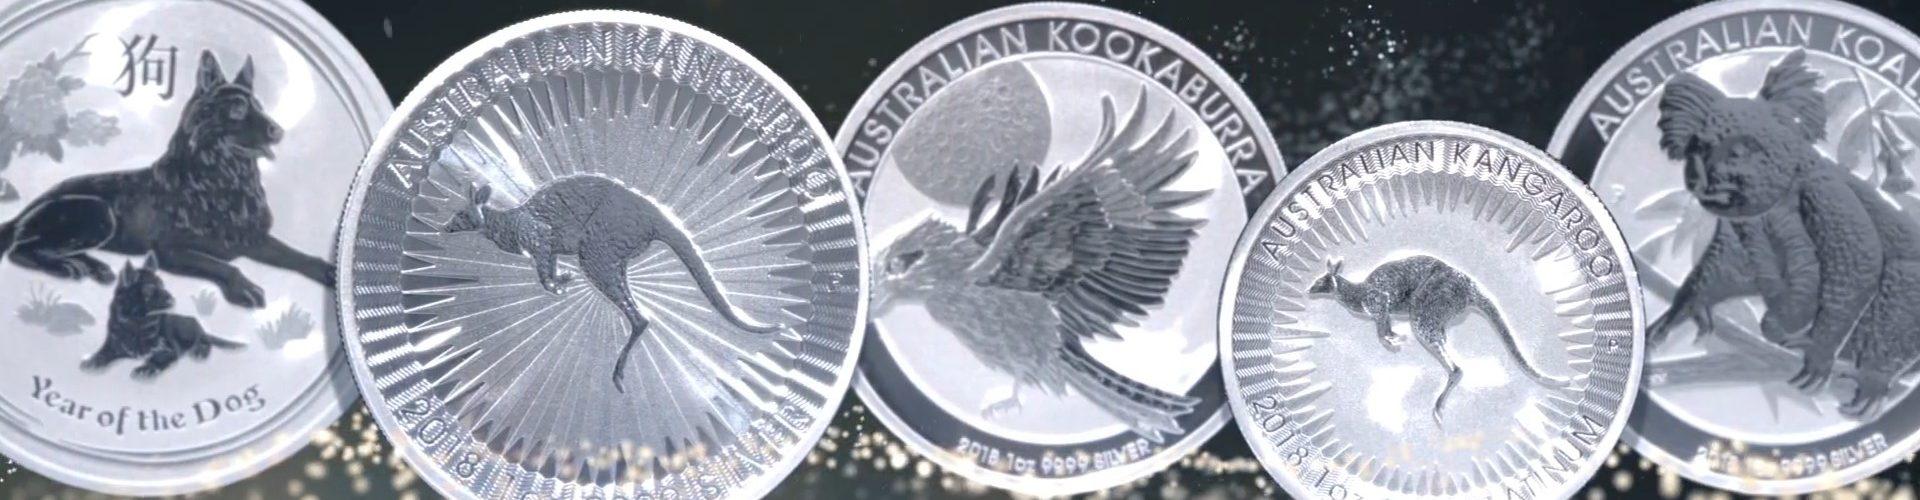 Perth Mint 2018 Bullion Coins Splash